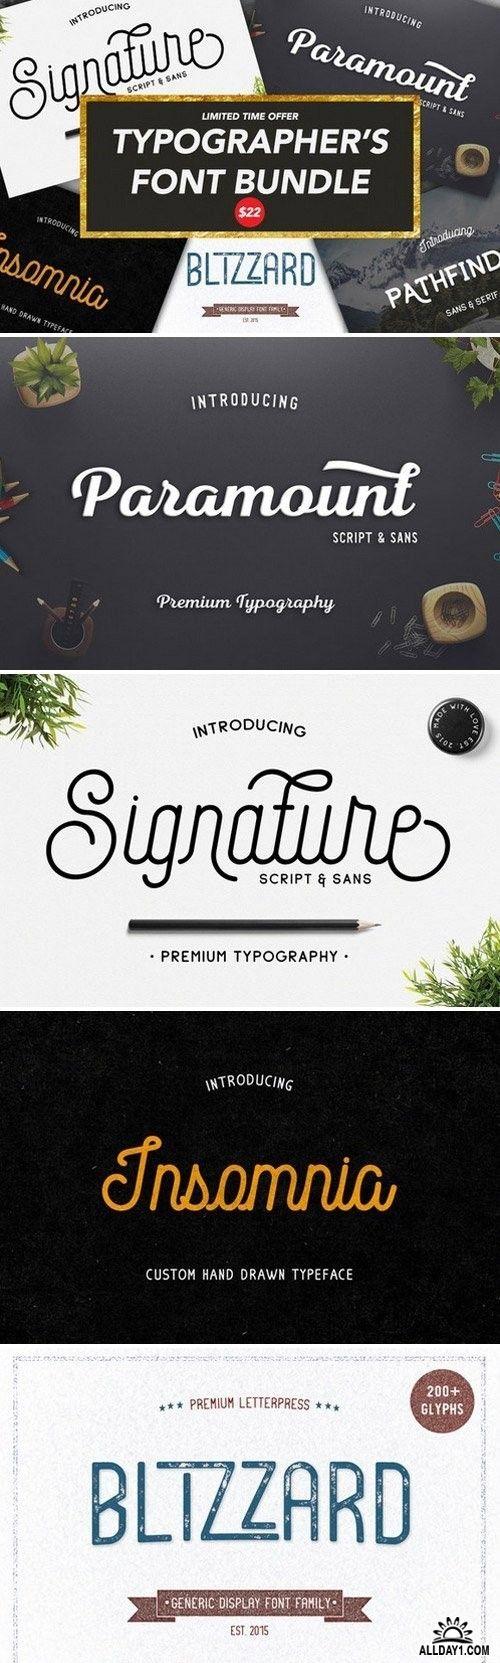 Typographer's Font Bundle